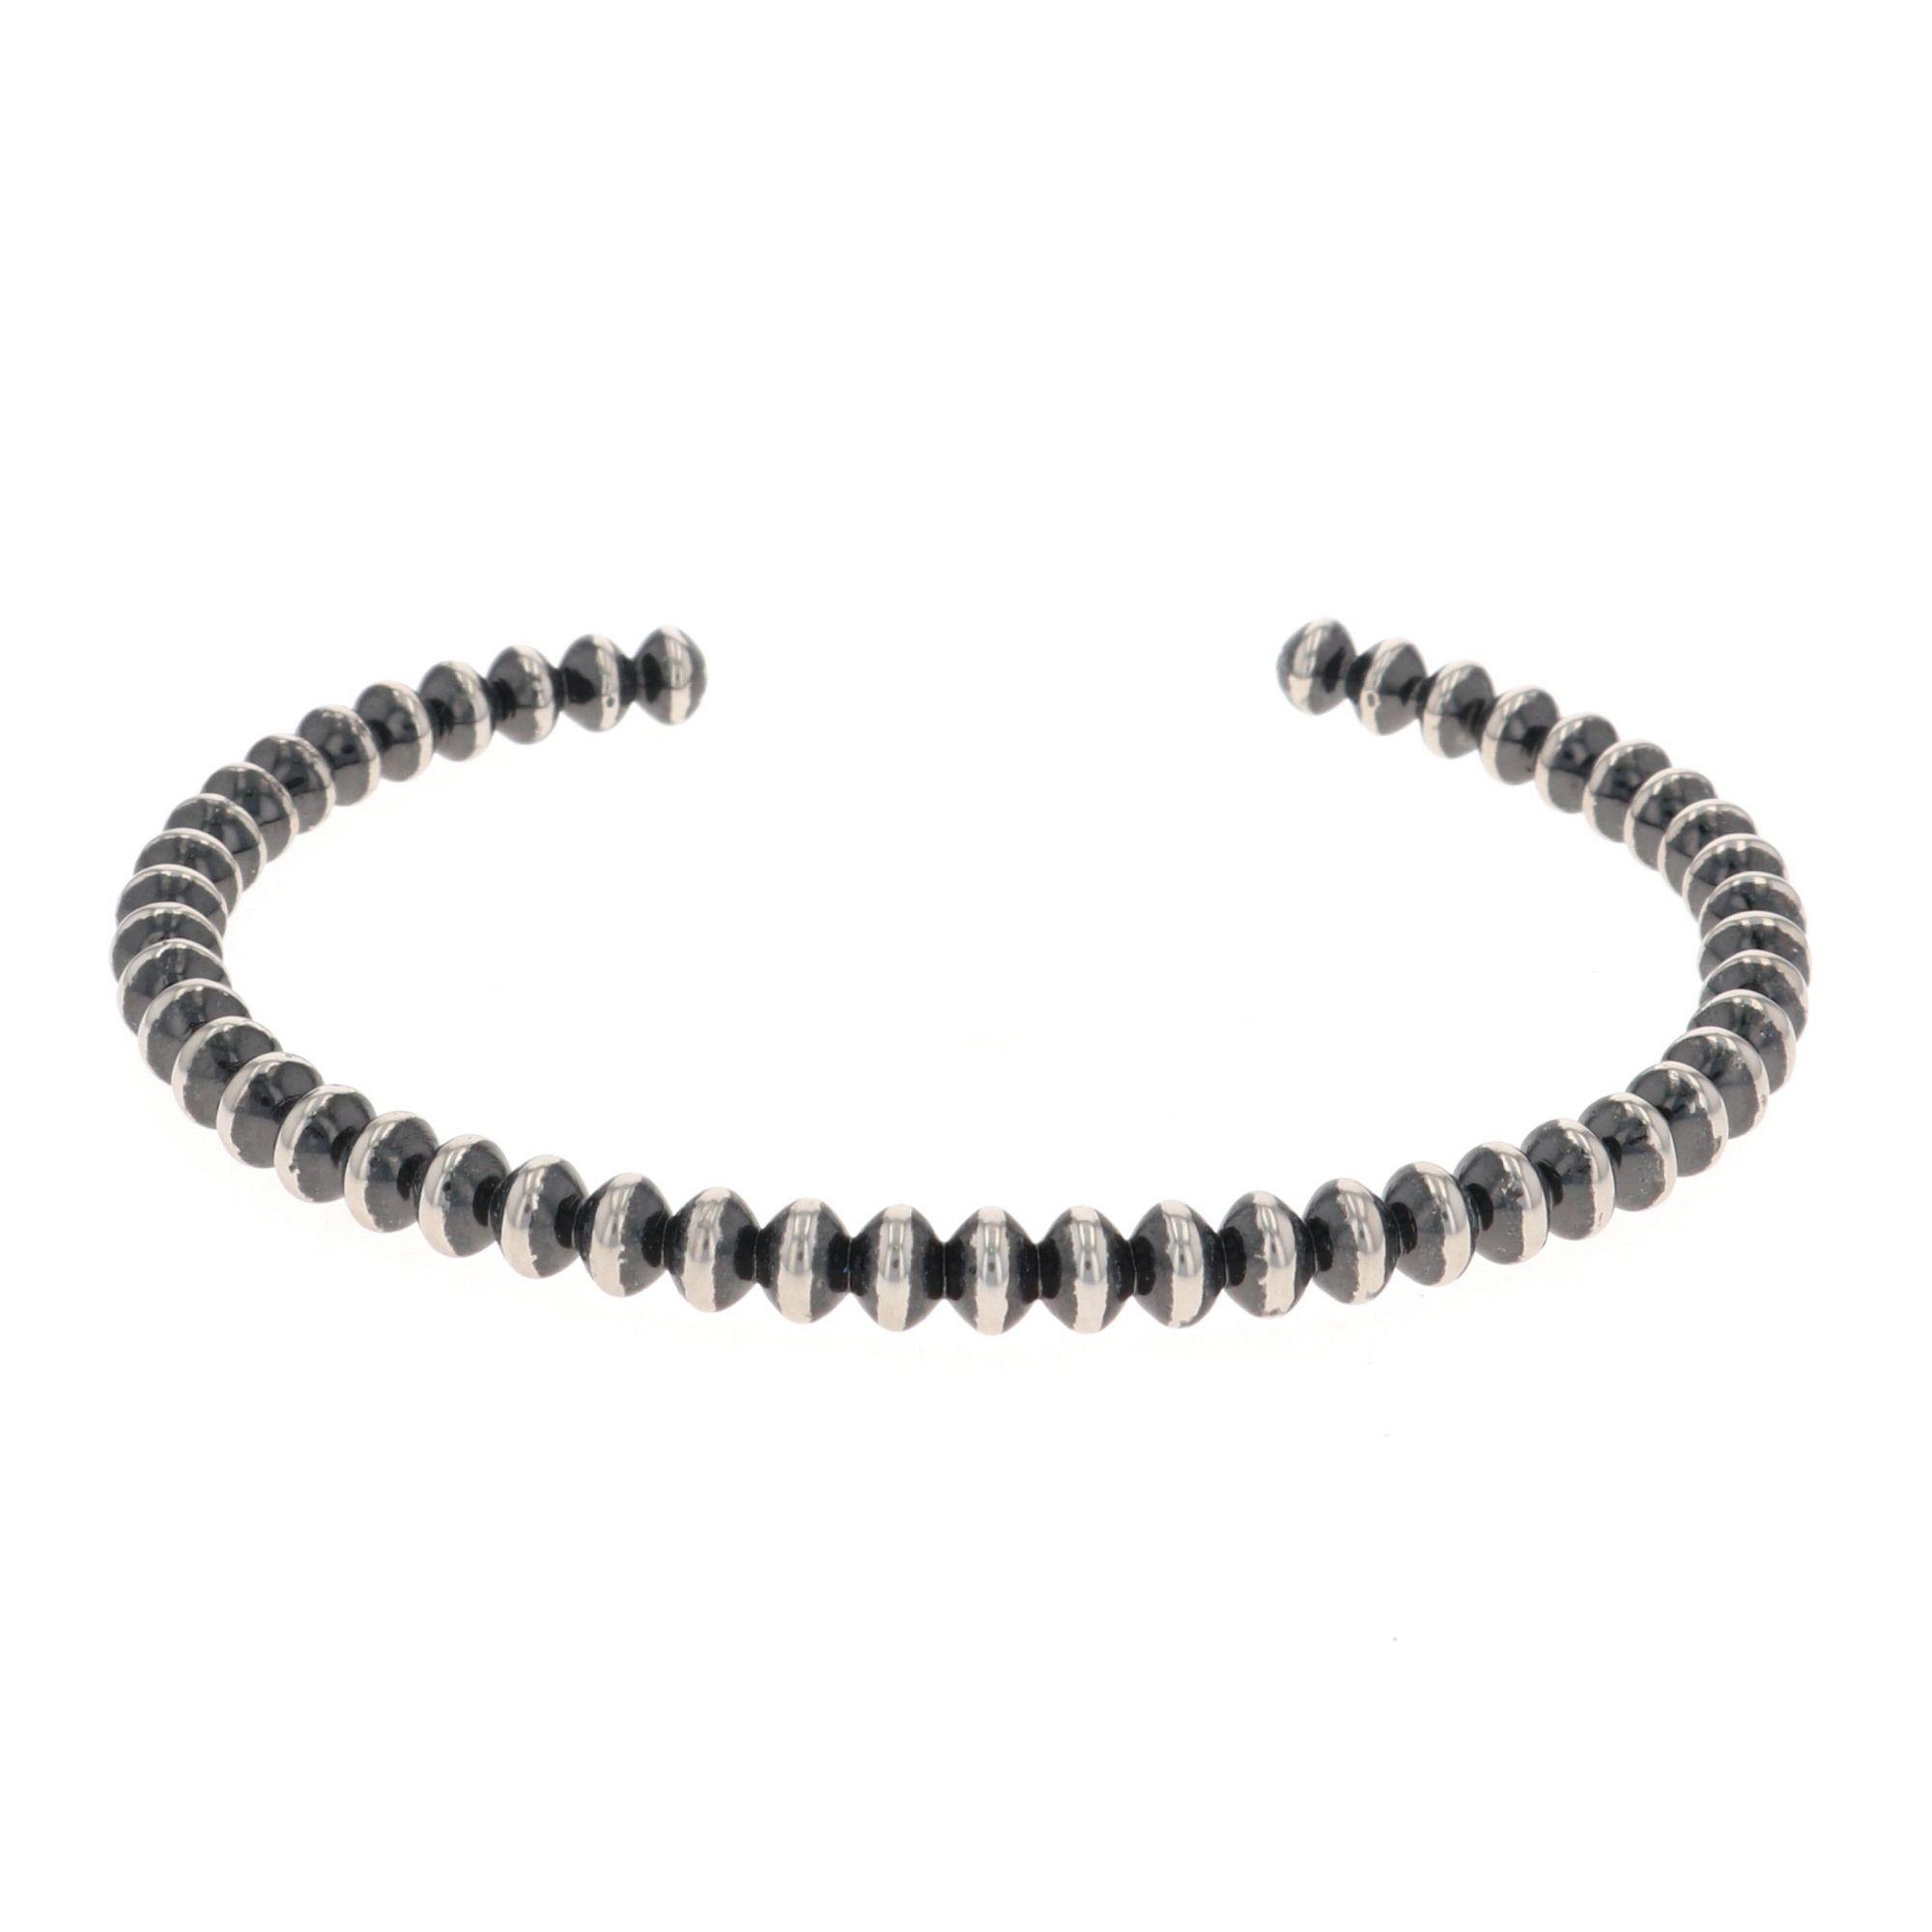 Beaded Legacy Cuff Bracelet